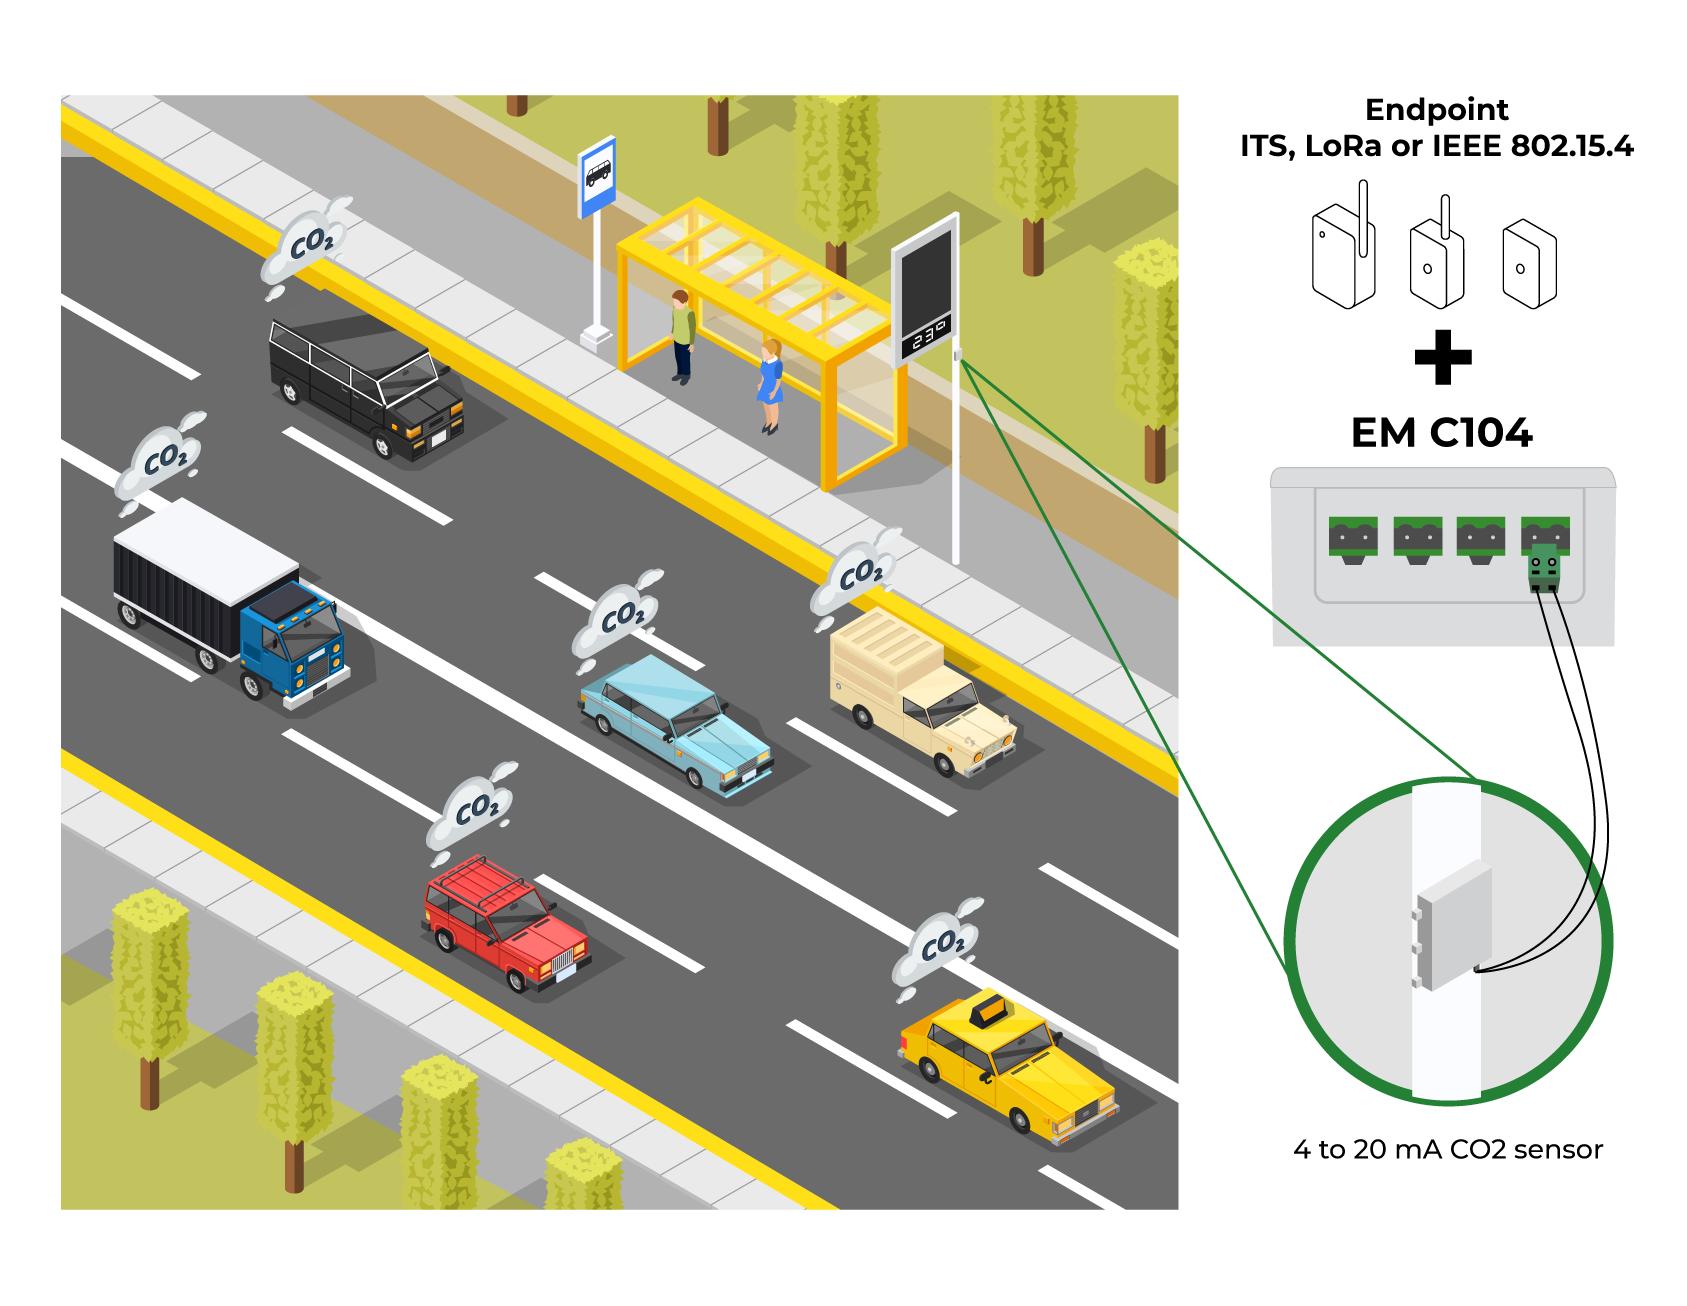 Application model - EM C104 (Khomp IoT Endpoint Extension)